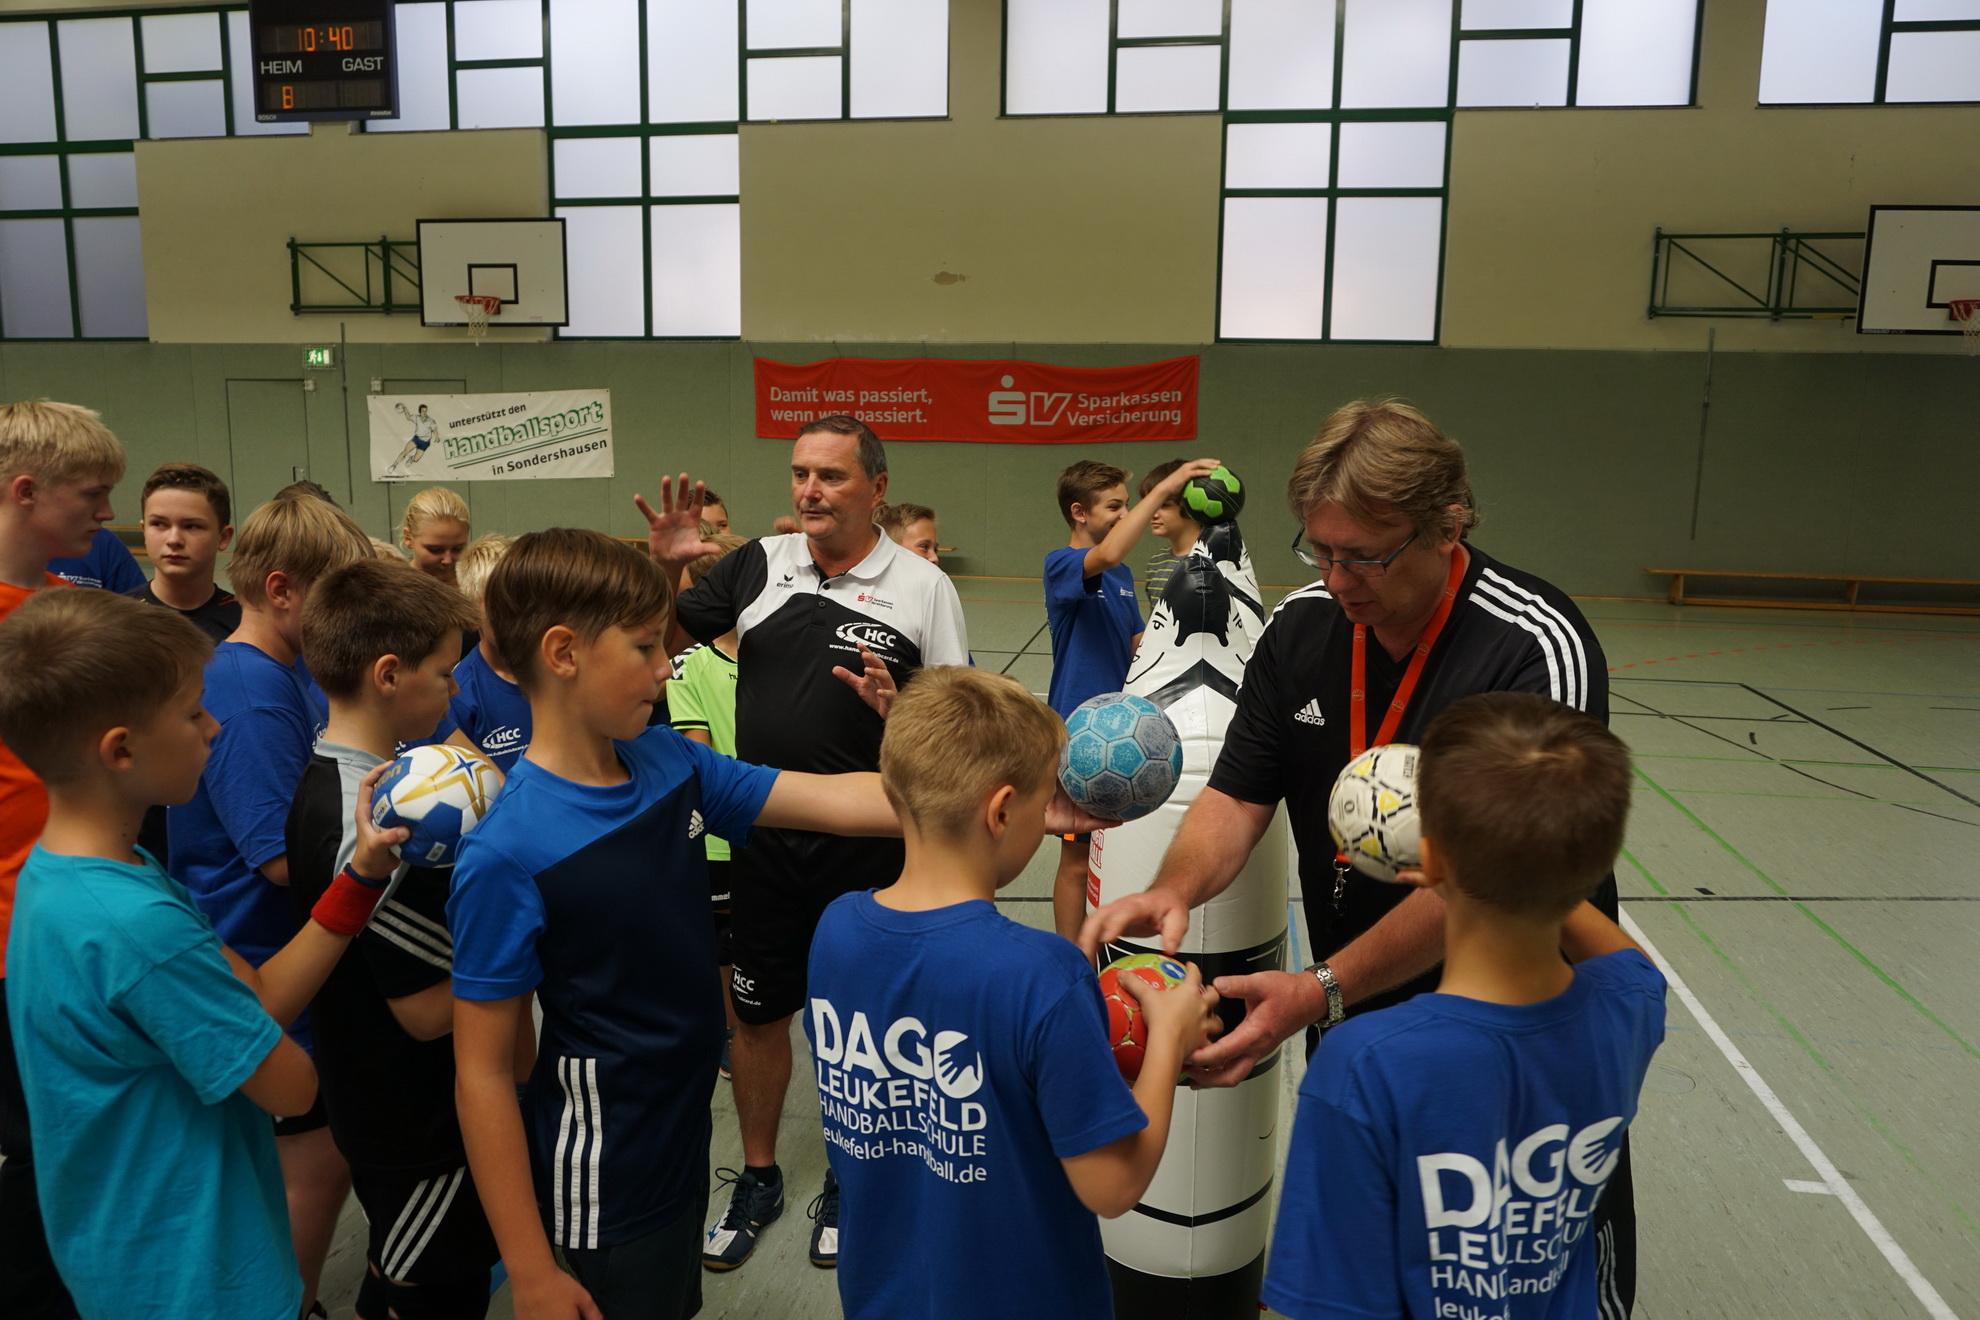 201808_Handballcamp_SDH_MG_200w